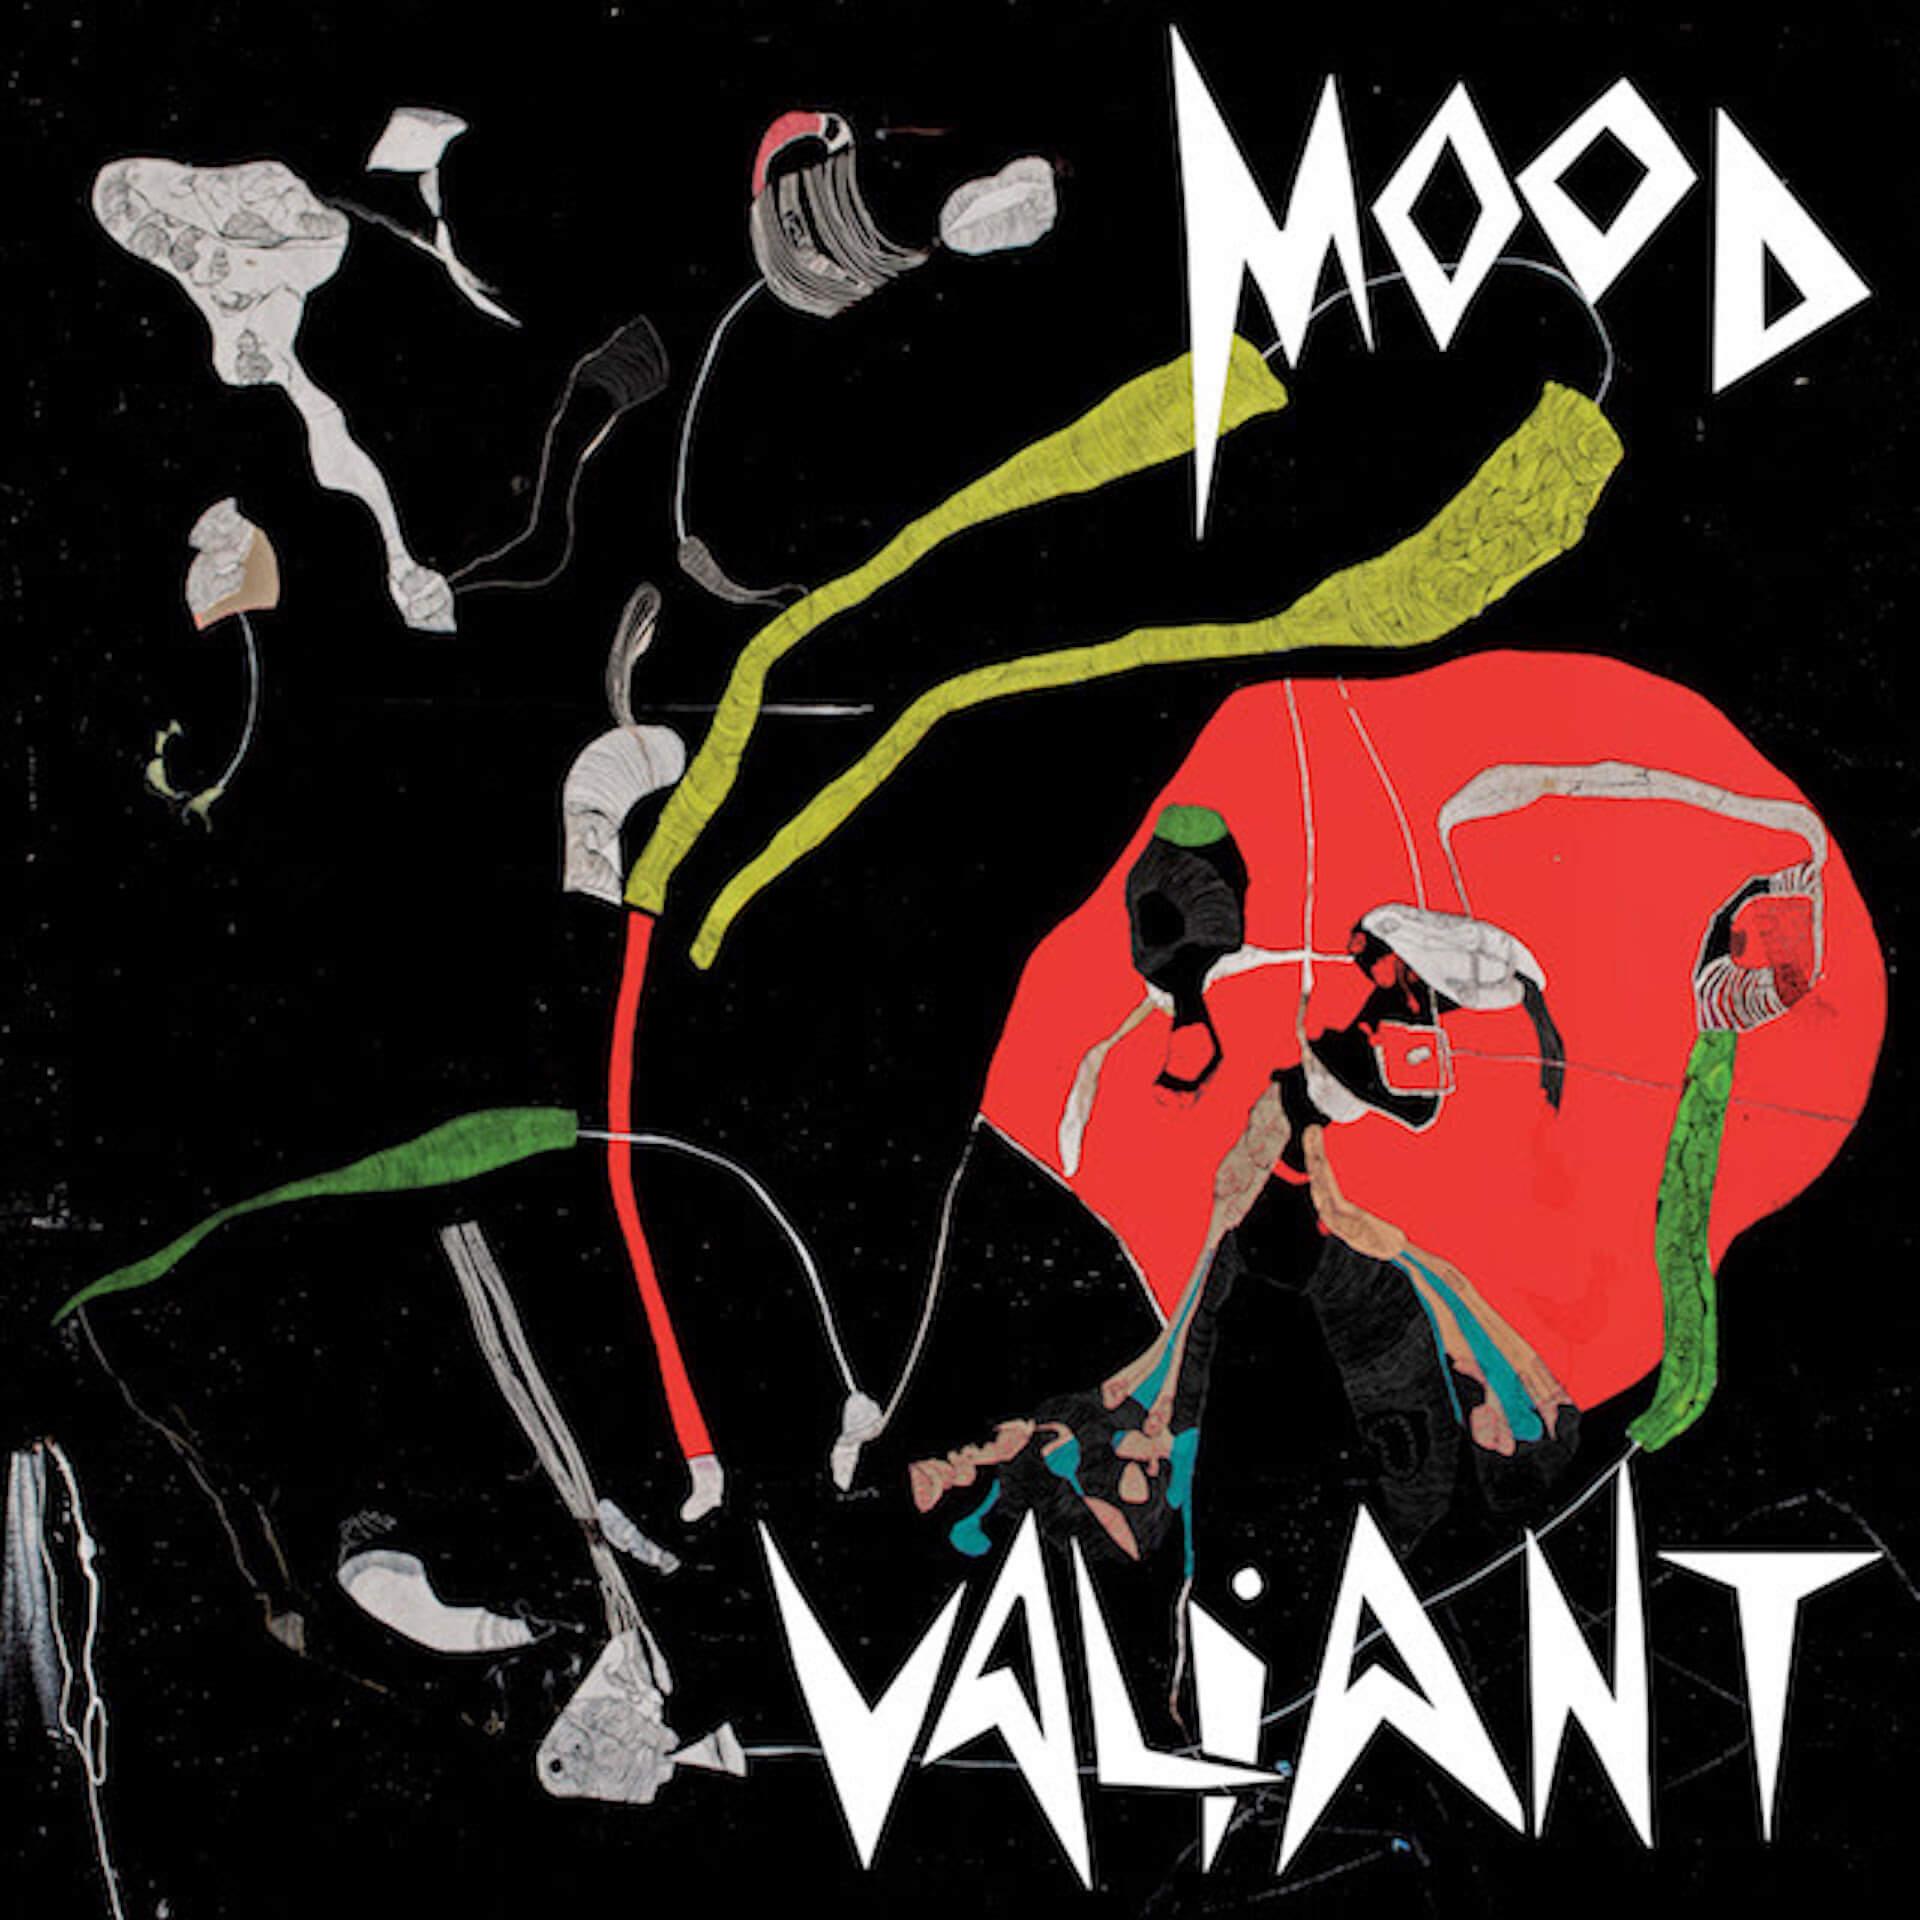 "Hiatus Kaiyoteが6月発売の新アルバム『Mood Valiant』収録曲""Red Room""をMVと共にリリース! music210427_hiatus-kaiyote-210427_2"